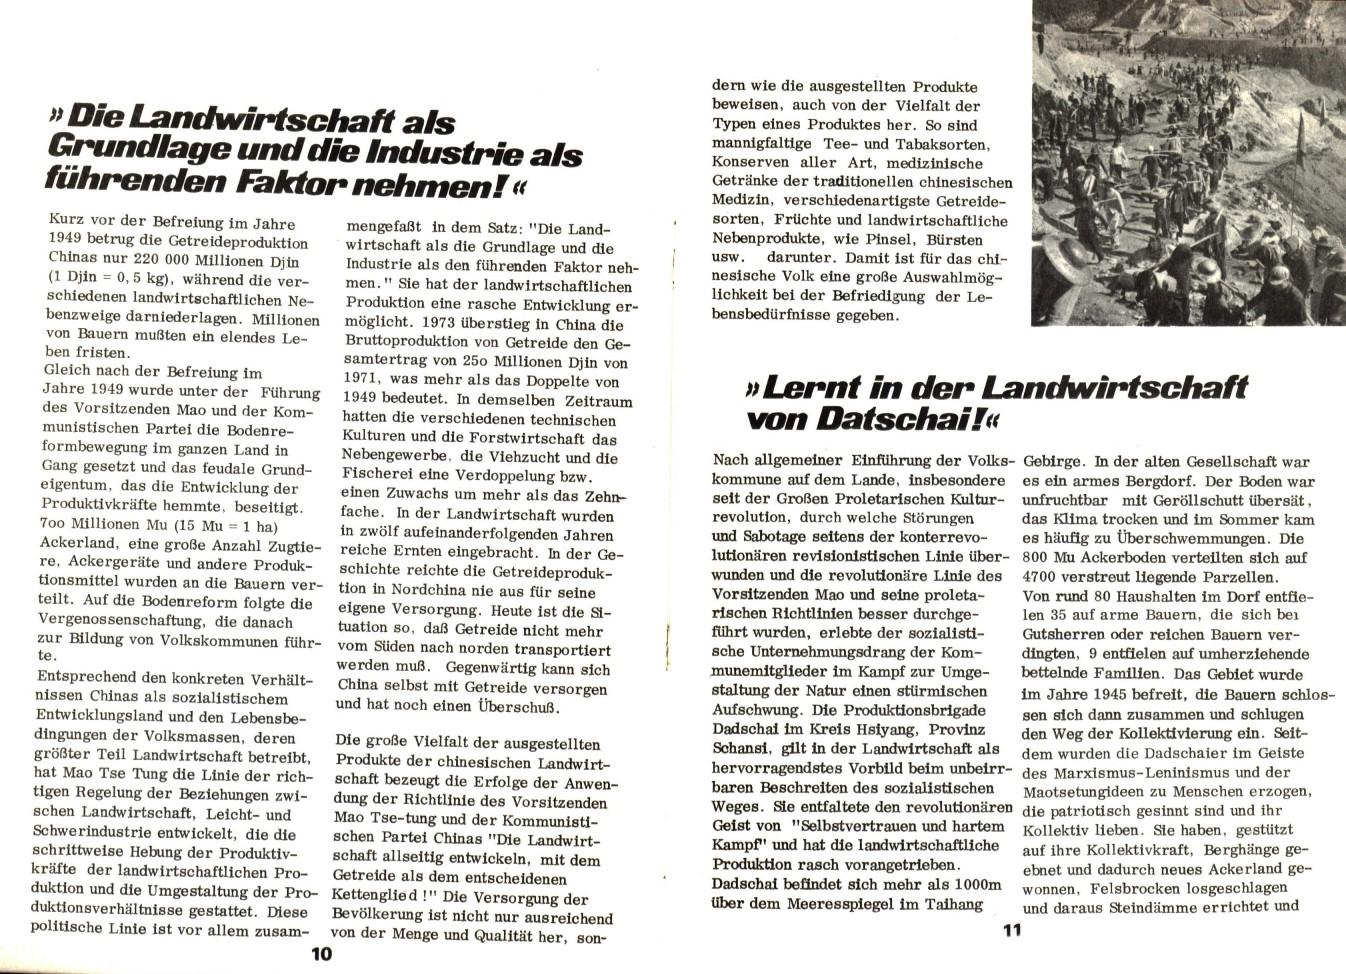 KPDAO_1975_Nationalausstellung_VRCh_in_Koeln_06